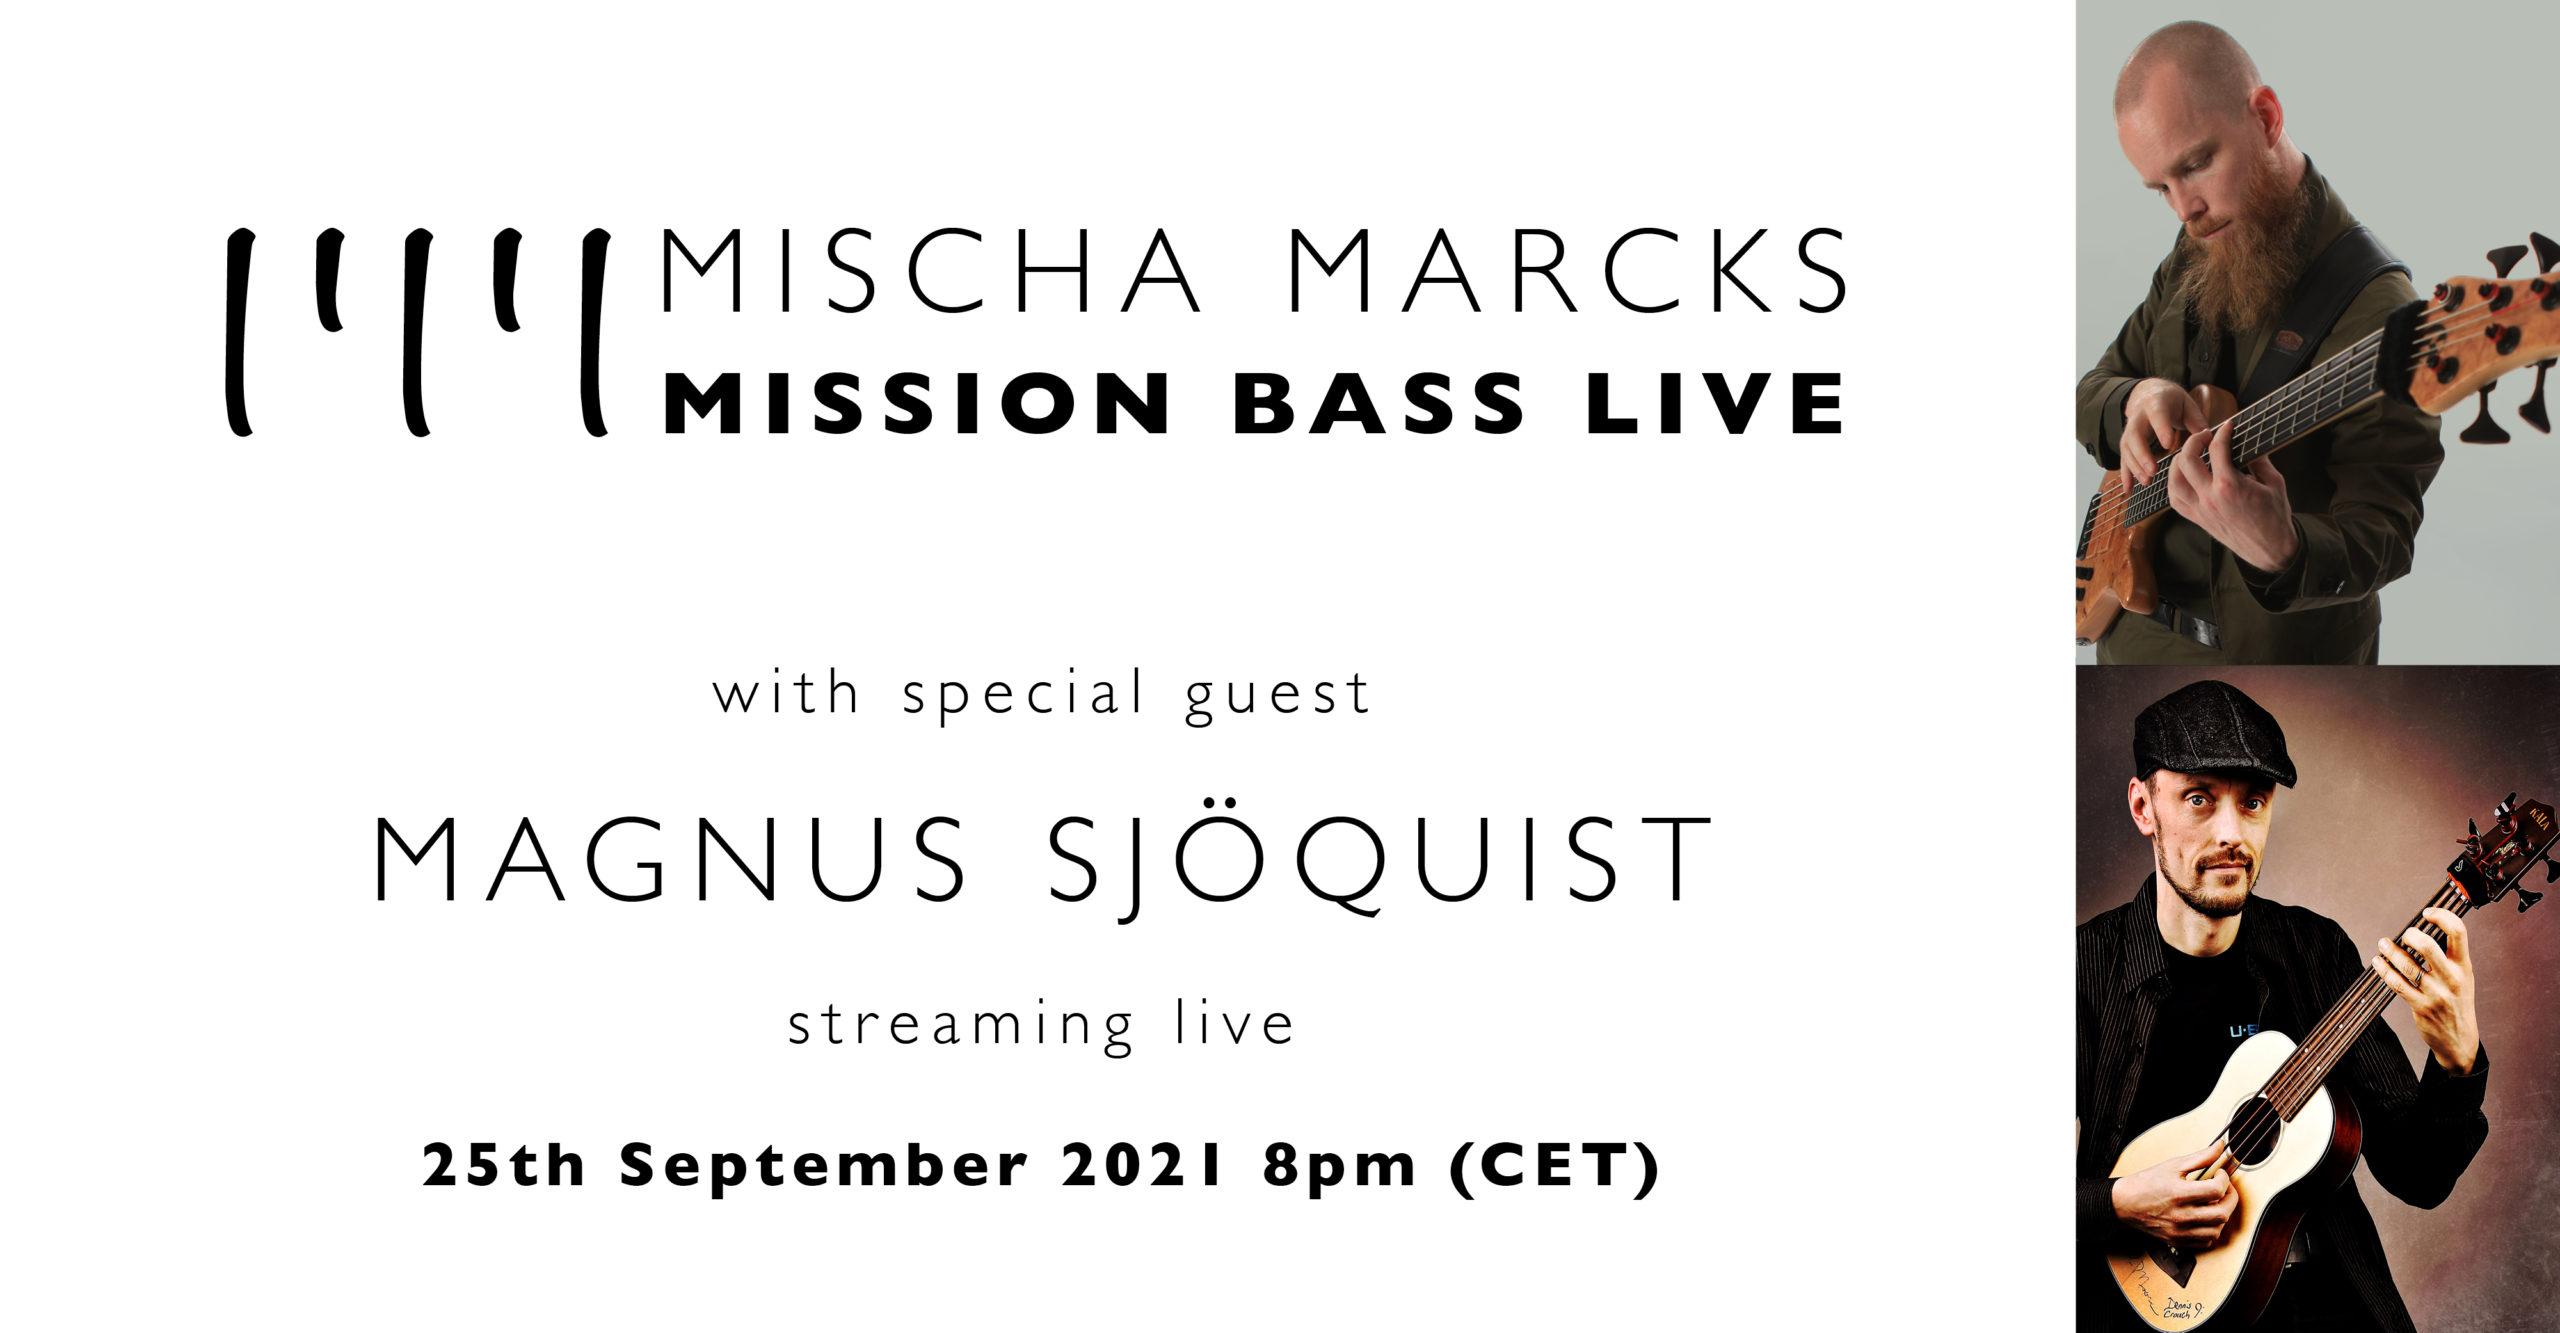 Mischa Marcks presents Mission Bass Live featuring Magnus Sjöquist